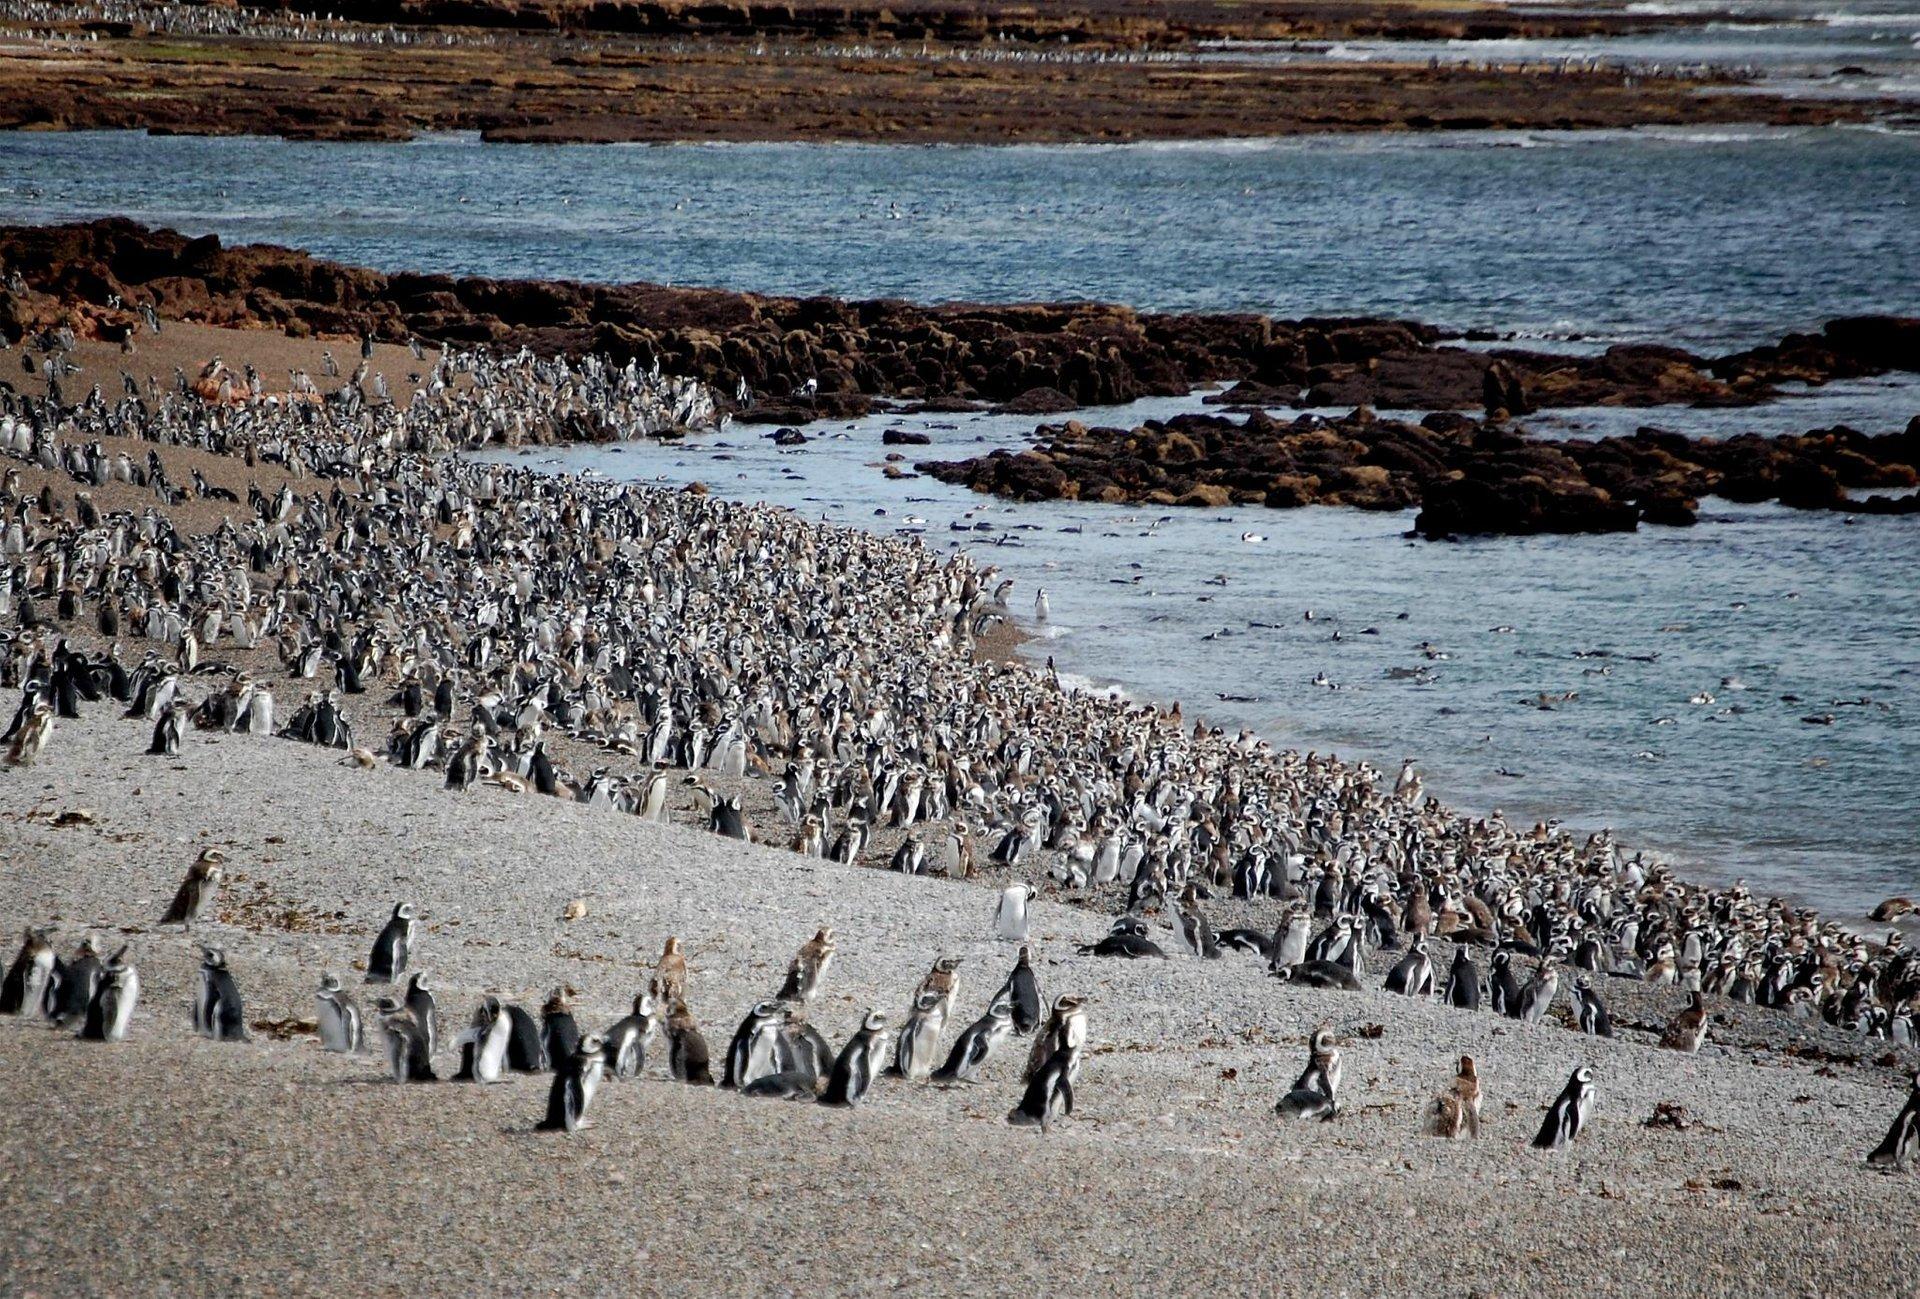 Punta Tomba Penguin Rookery 2020